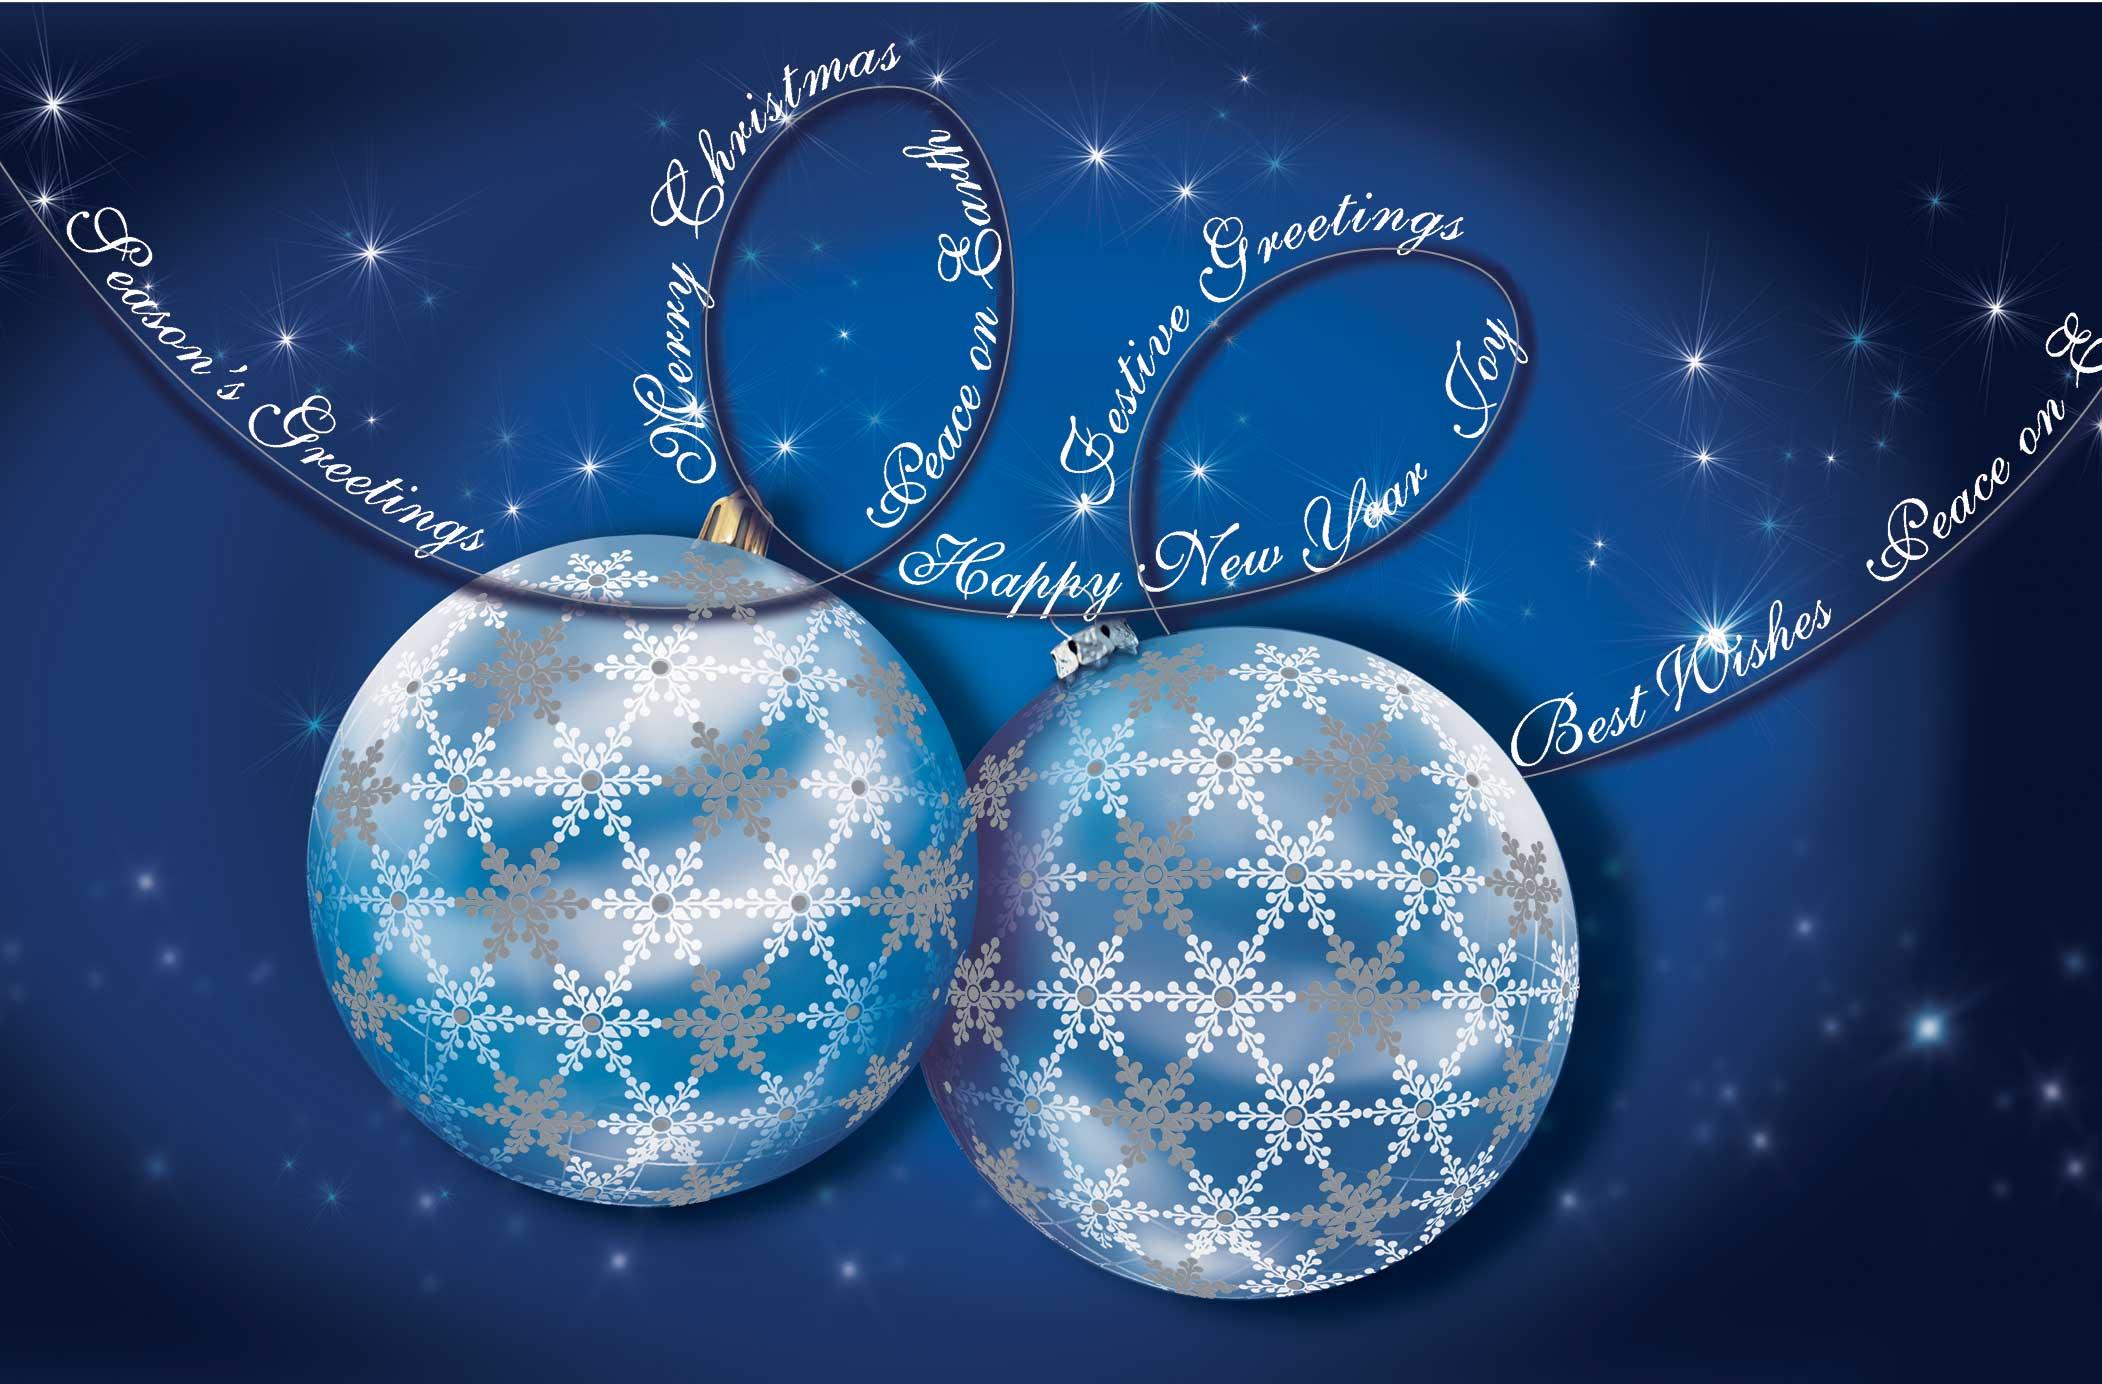 Uncategorized Cute Christmas Cards